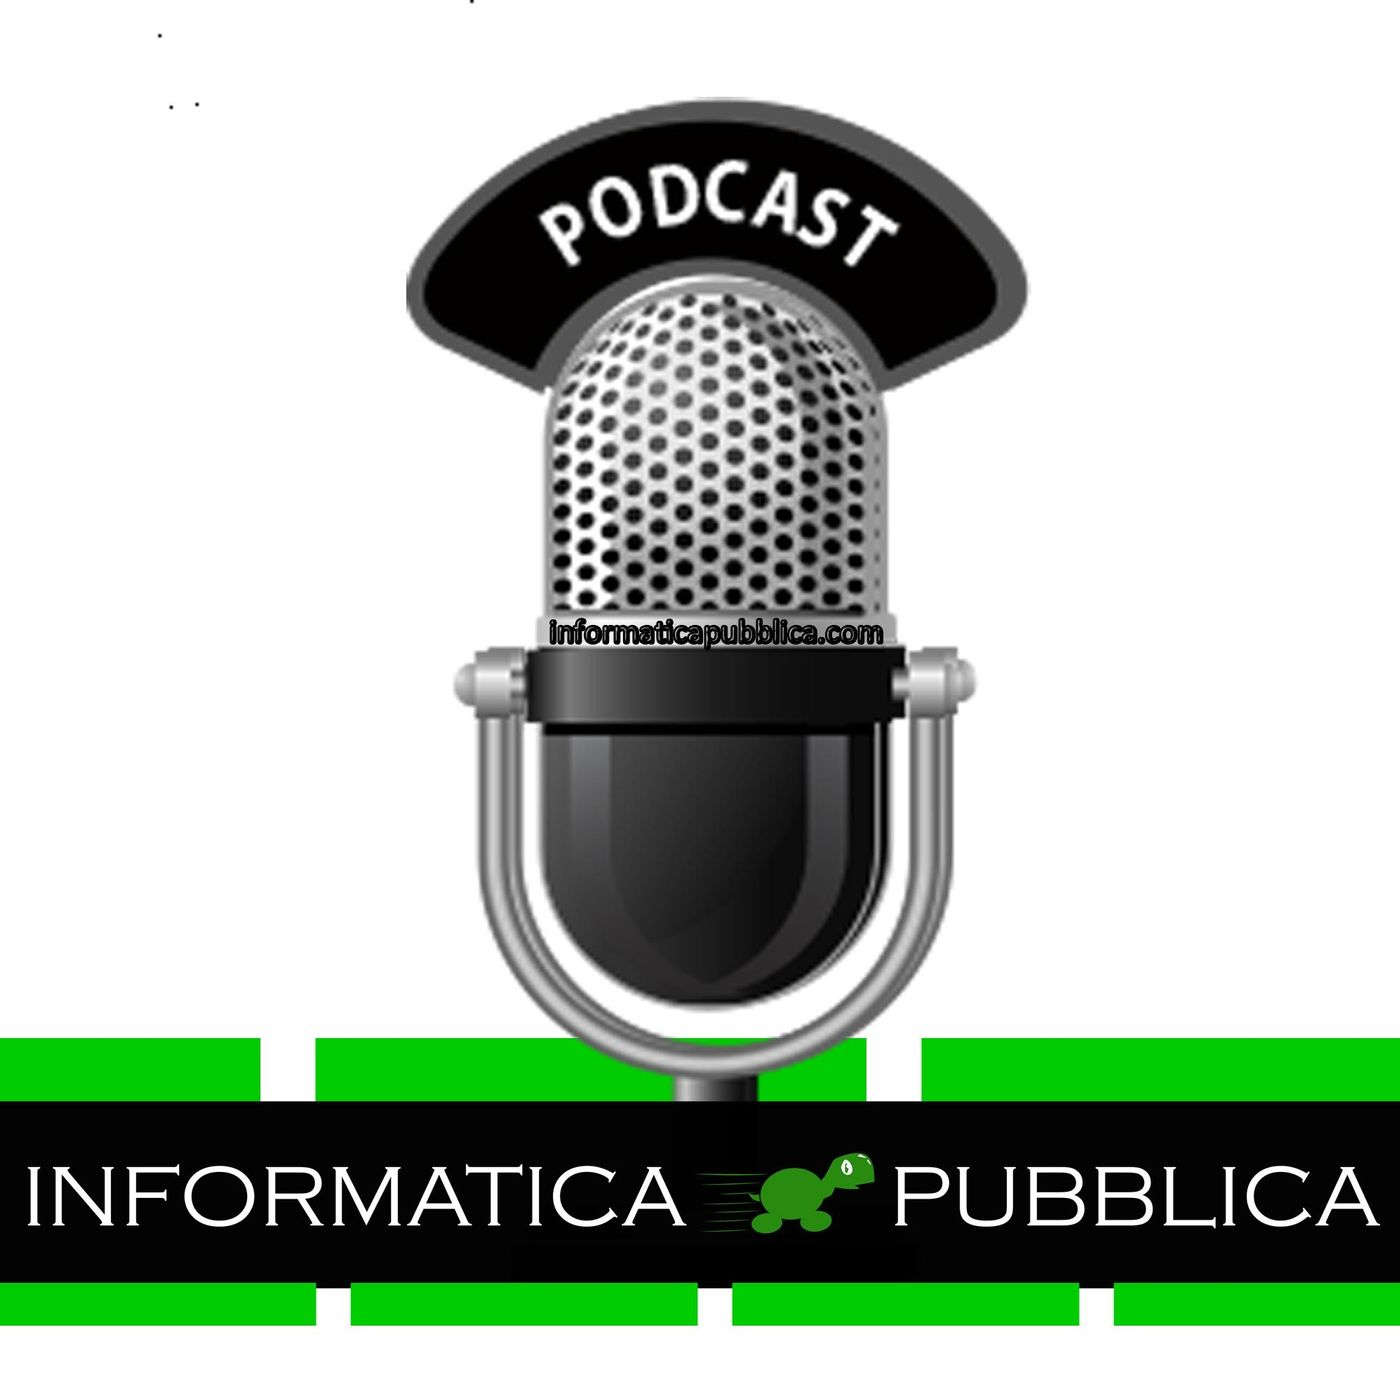 www.informaticapubblica.com